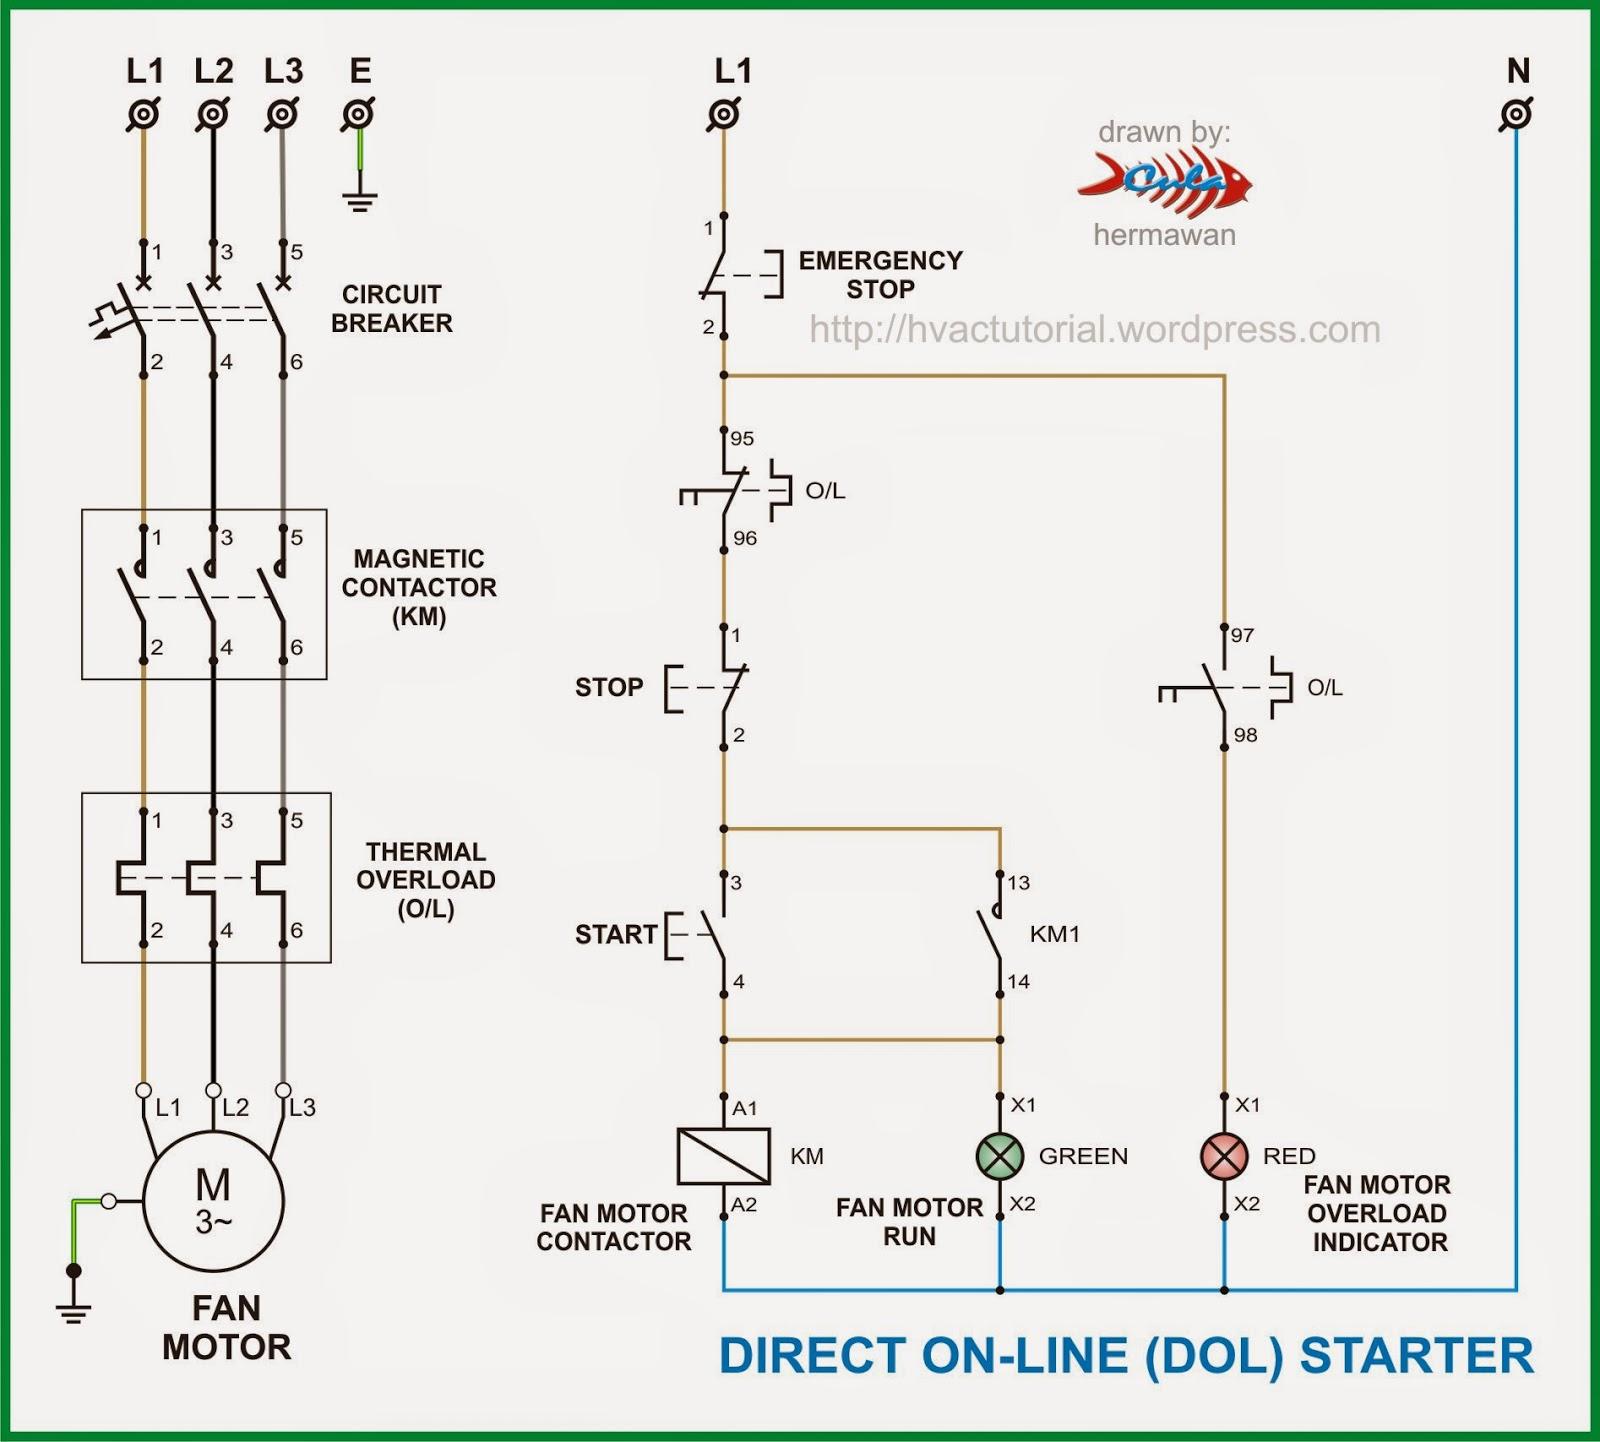 Motor Starting Characteristics on DOL Starter